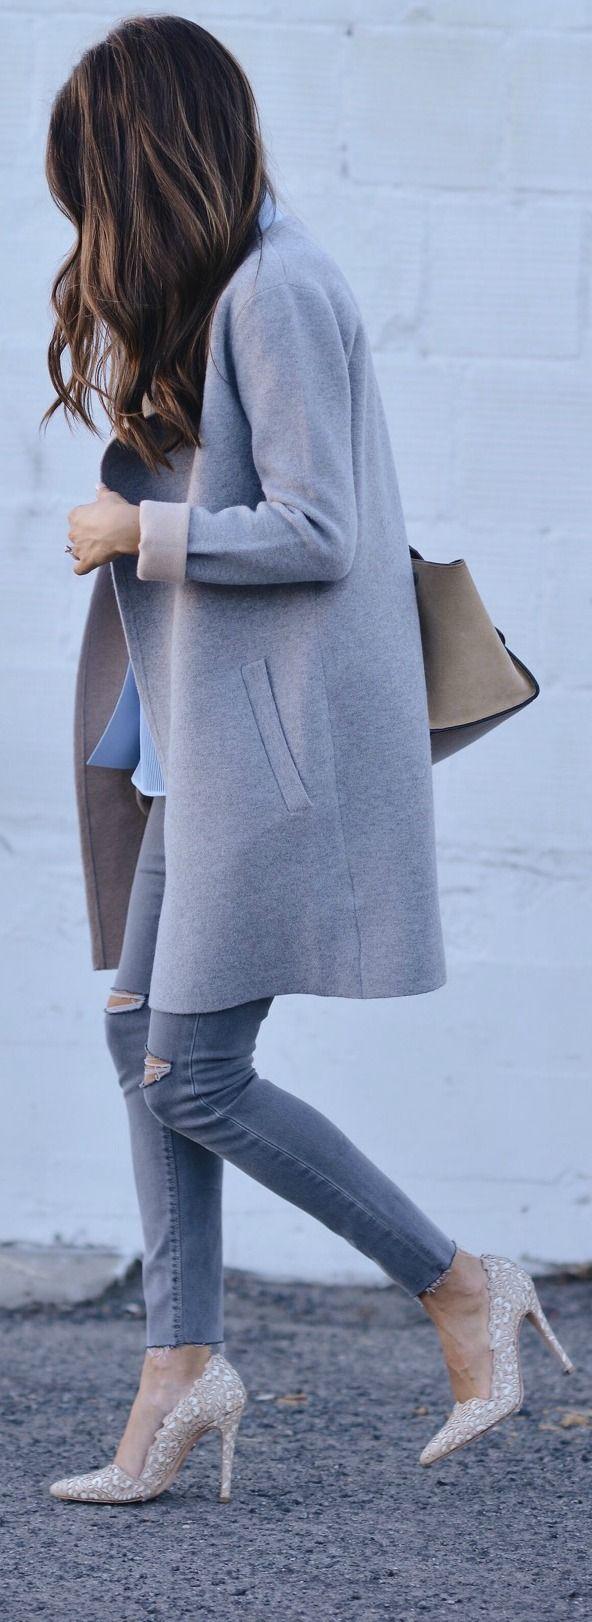 Long grey coat + sparkle heels.   pinterest : @tileeeeyahx3 ☼